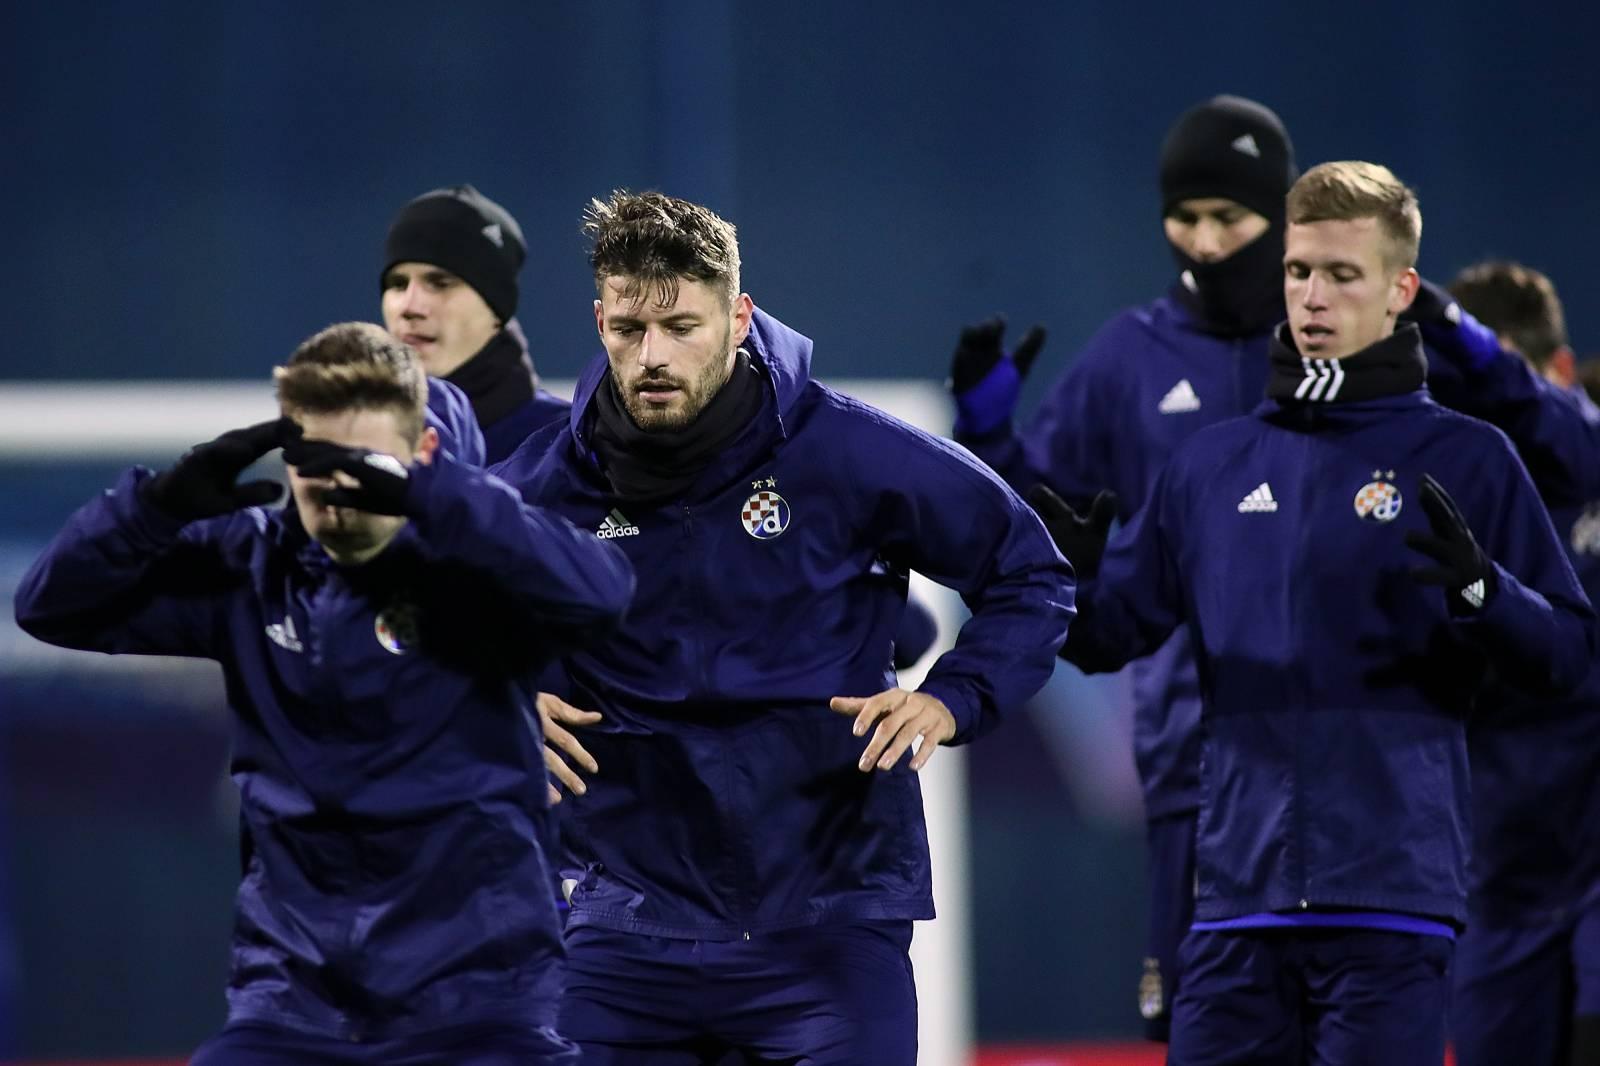 Zagreb: Nogometaši Dinama odradili trening